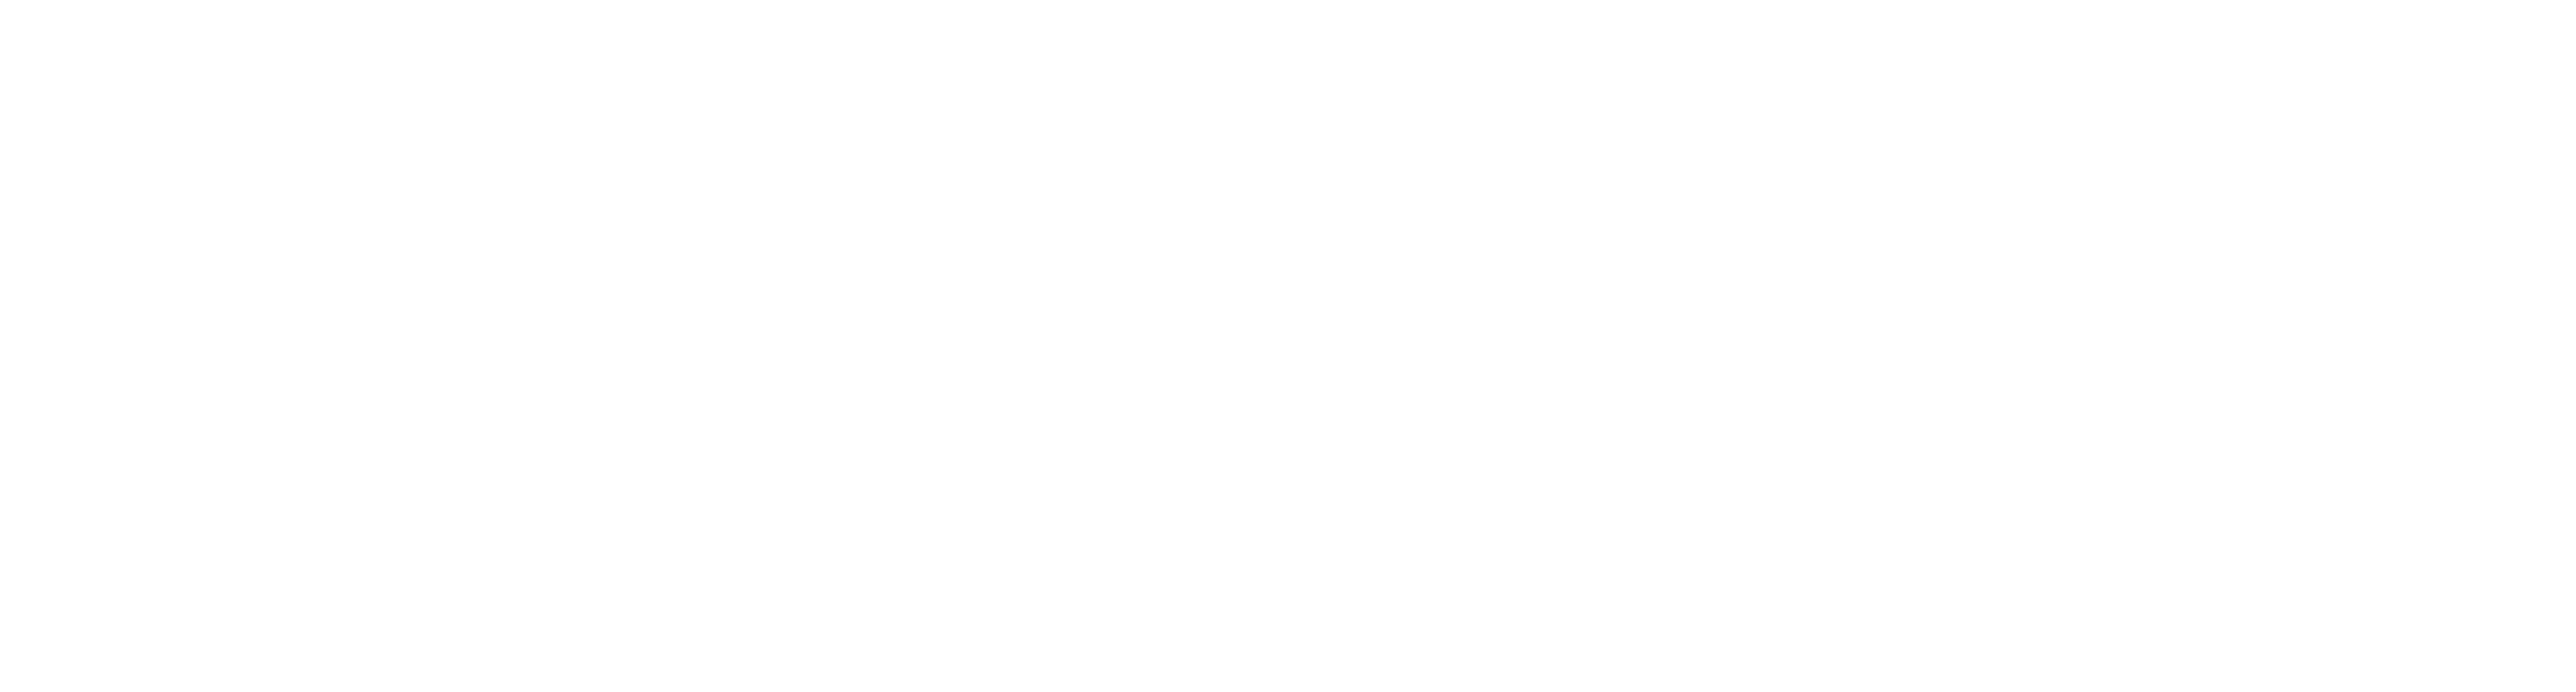 1 logo hollard